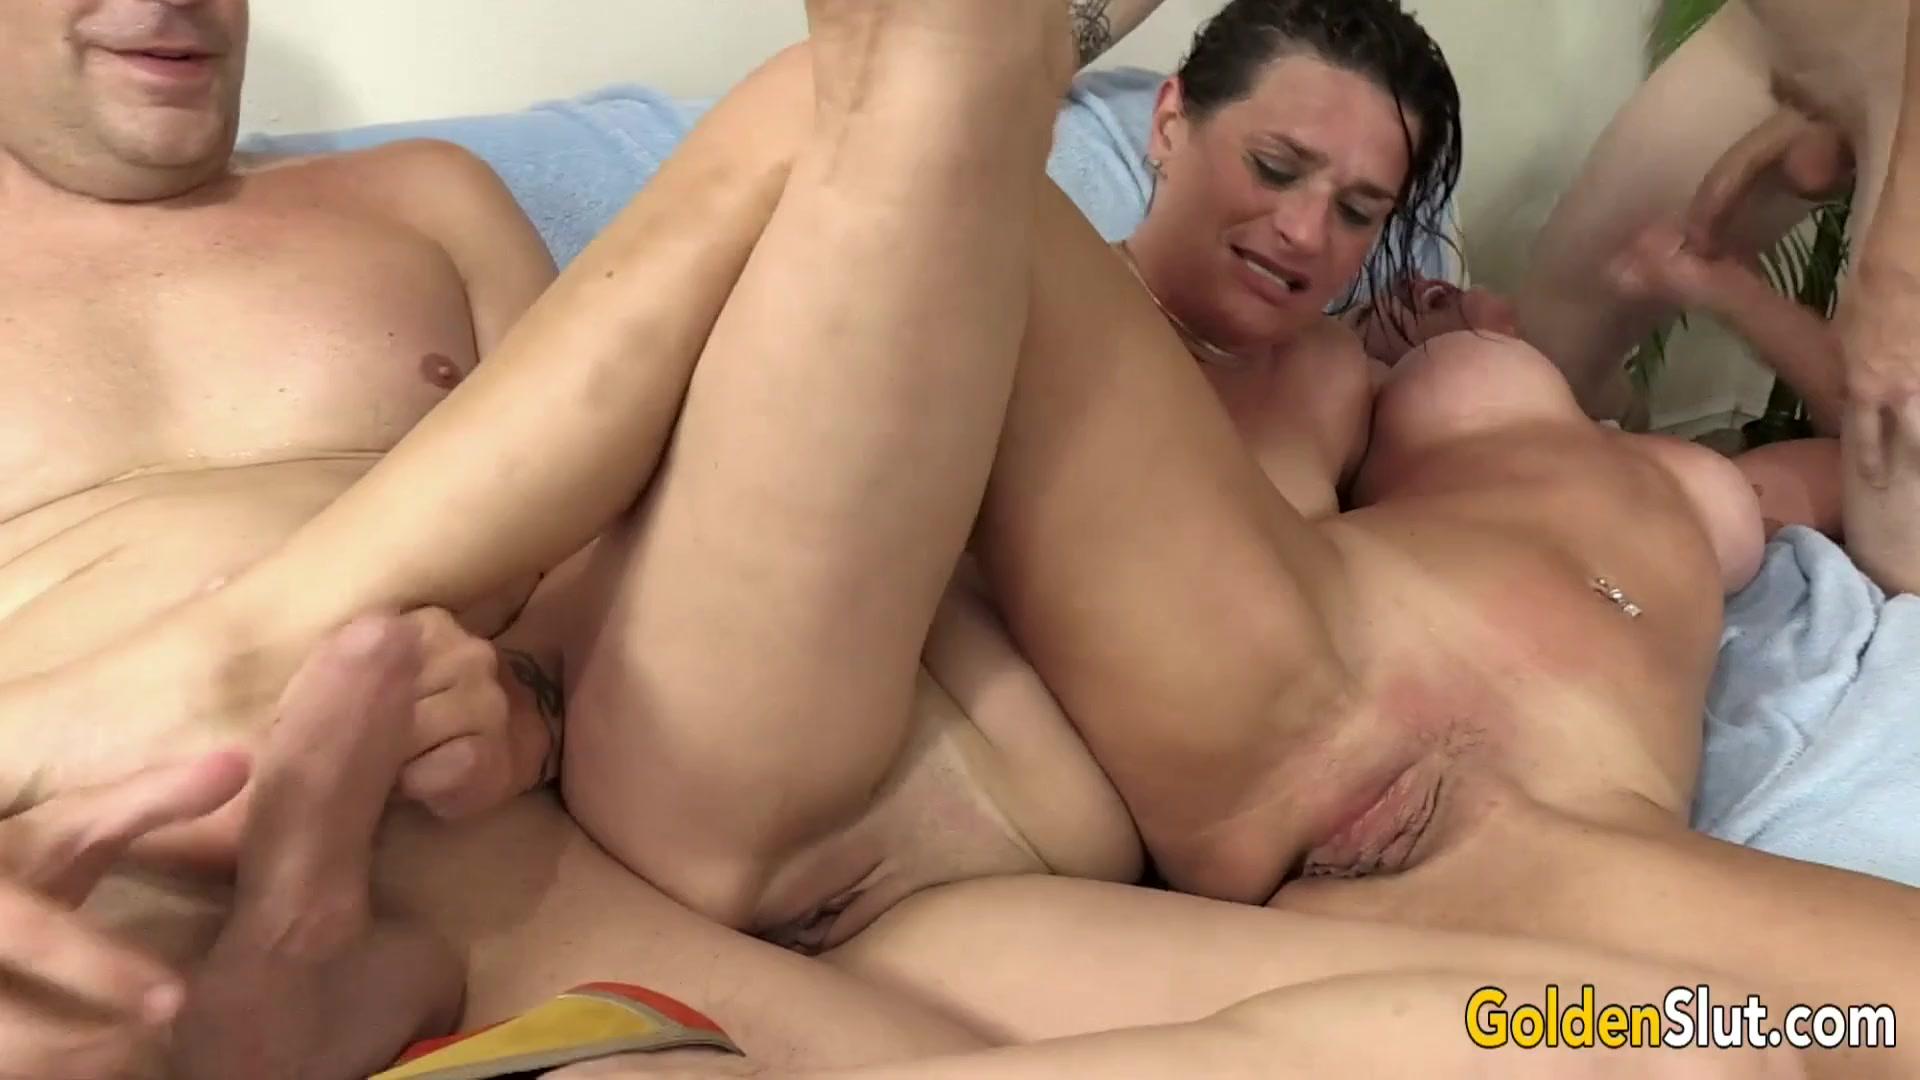 group-sex-pic-shemale-video-clip-sample-masturbation